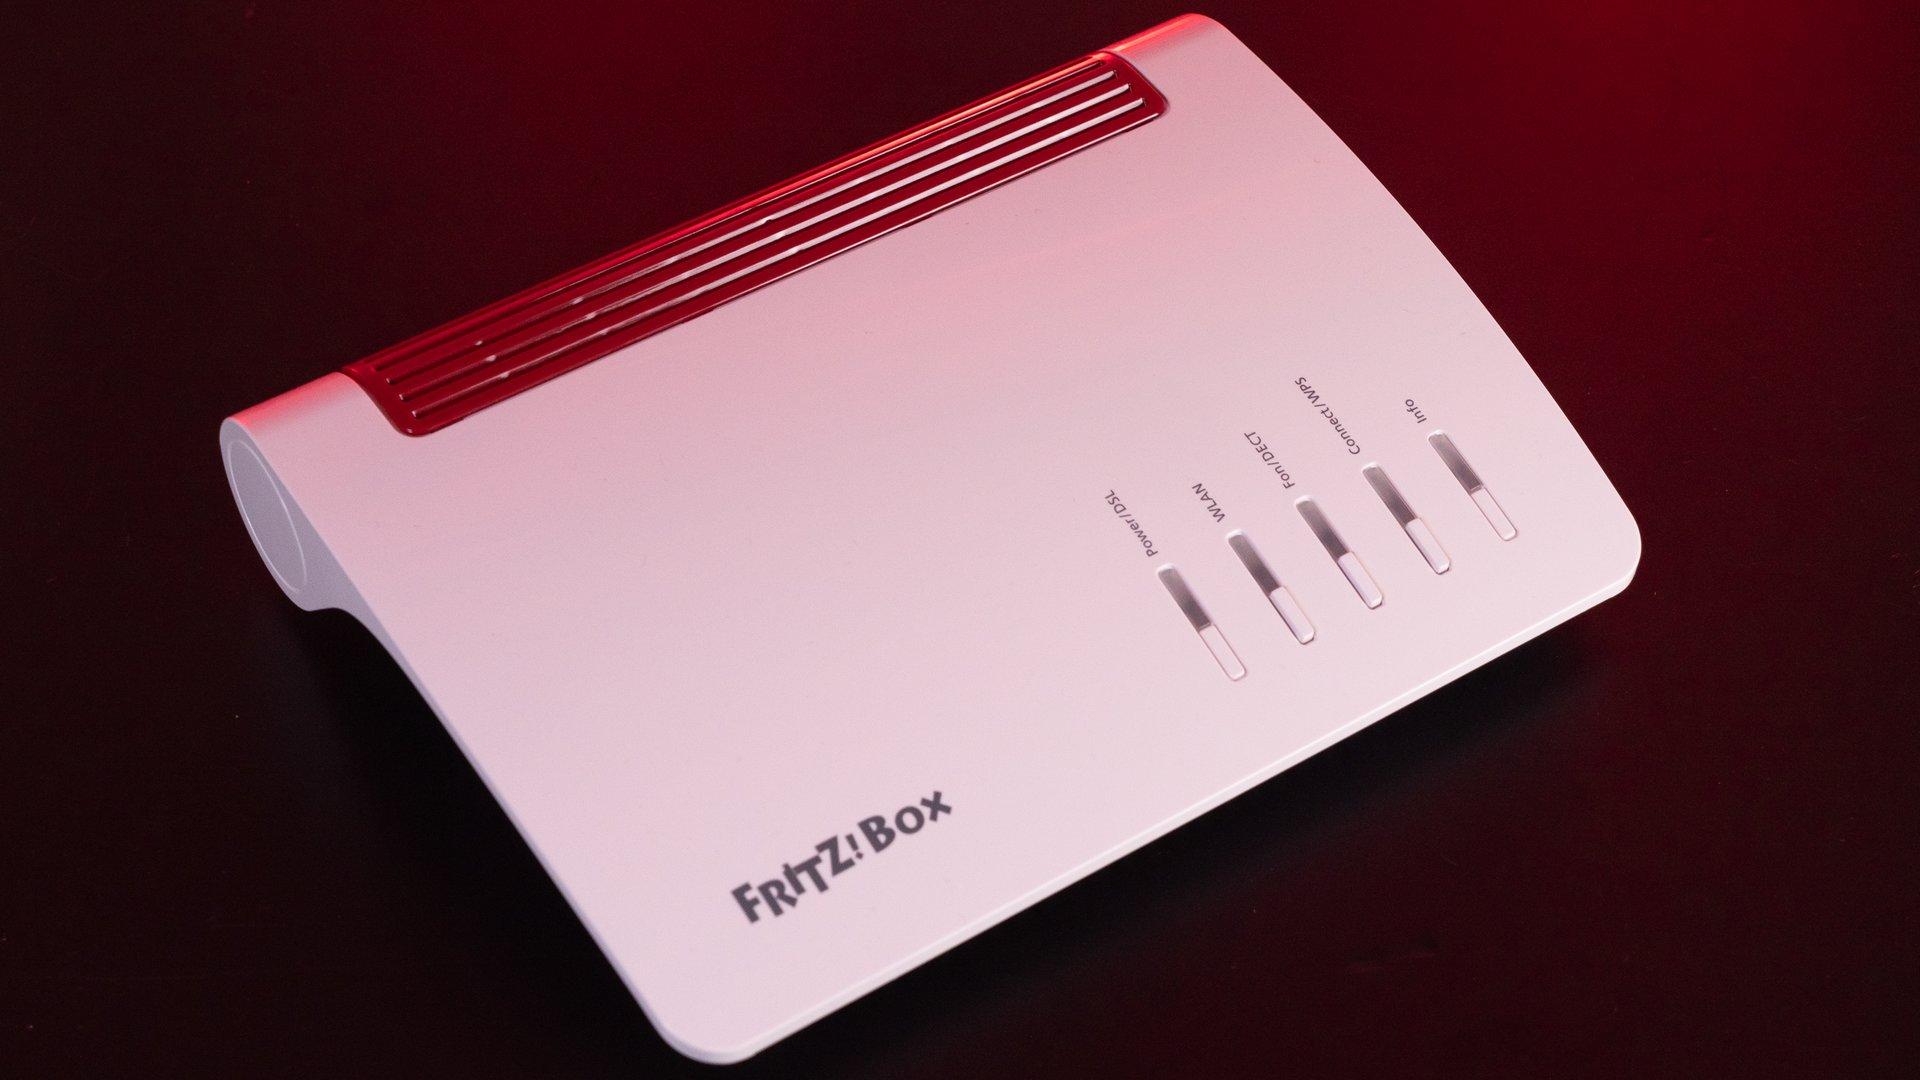 FritzBox 20 im Preisverfall Top Router aktuell besonders ...